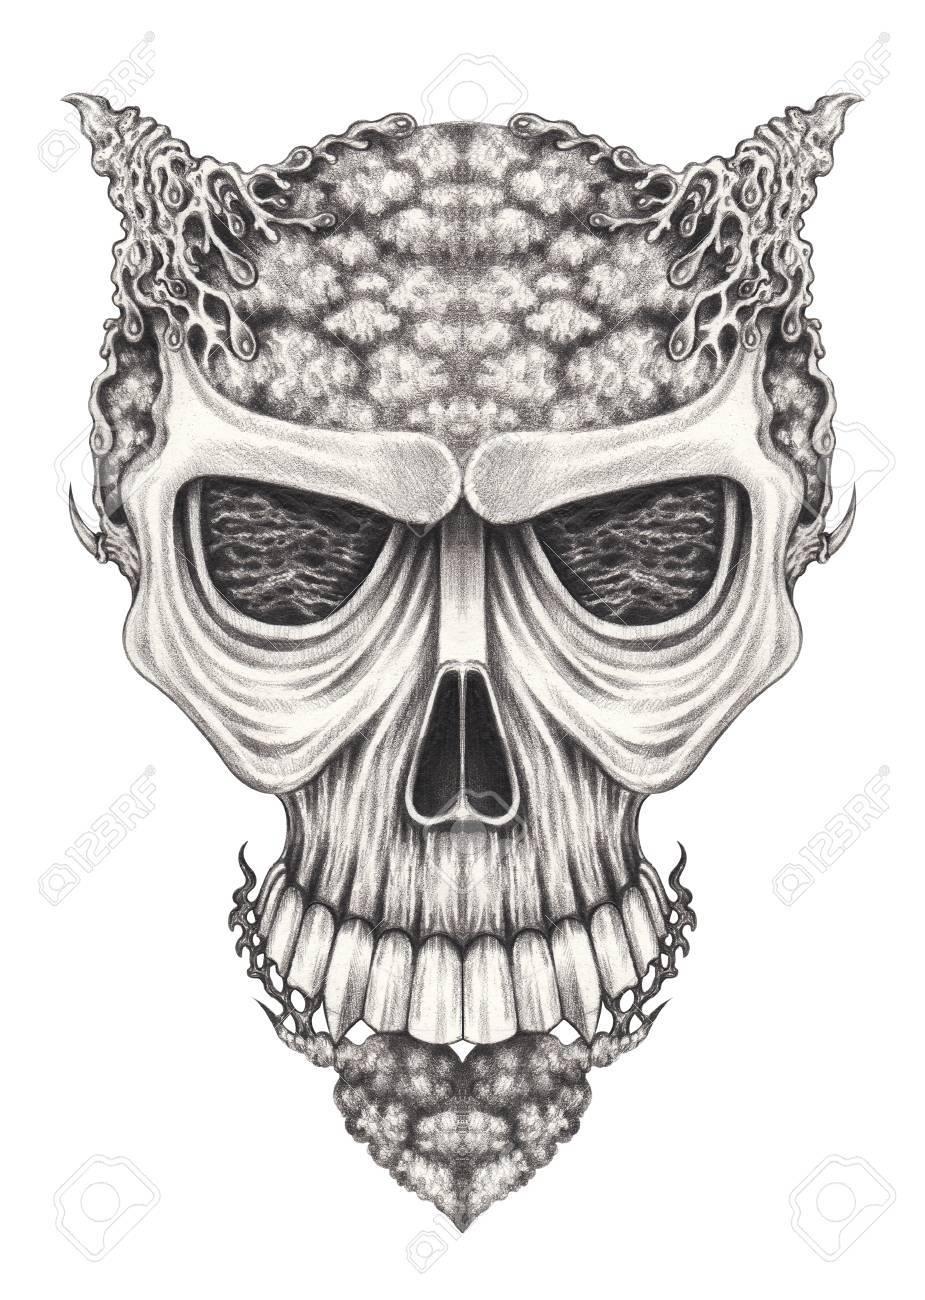 Arte Surrealista Dibujo De Lapiz Sobre Papel Skull Hand Fotos